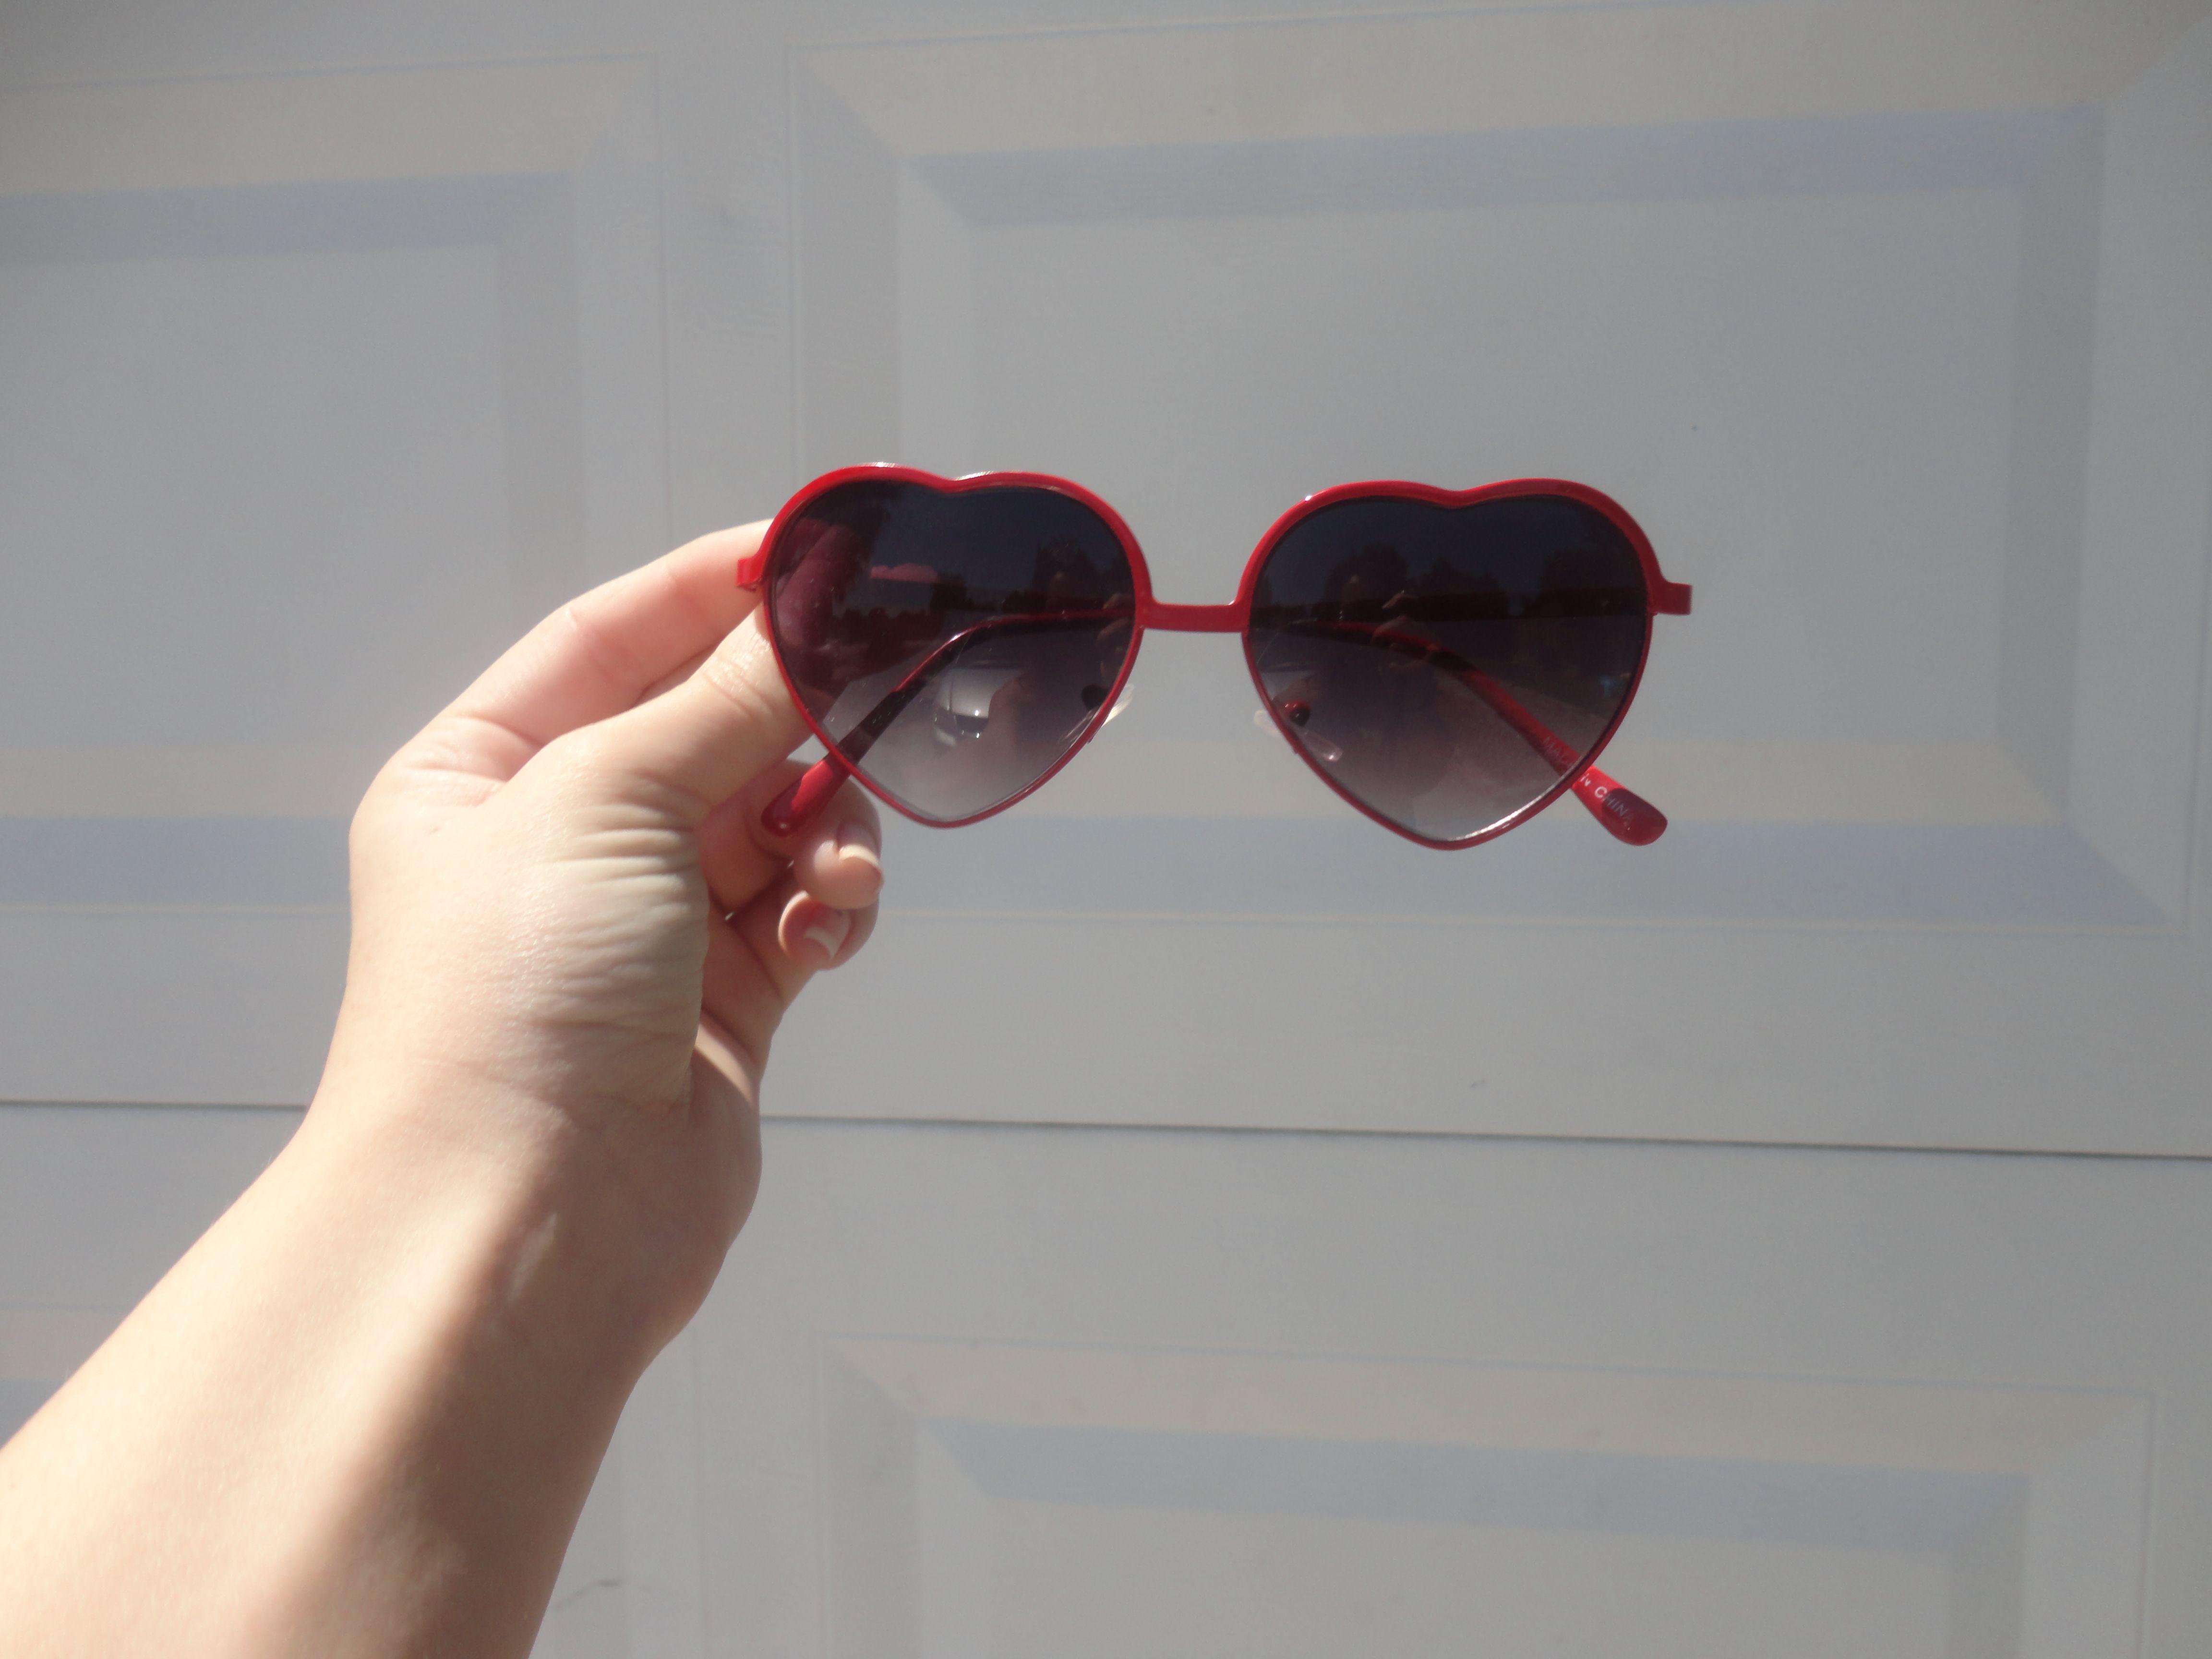 My heart shaped sunglasses are so cute.